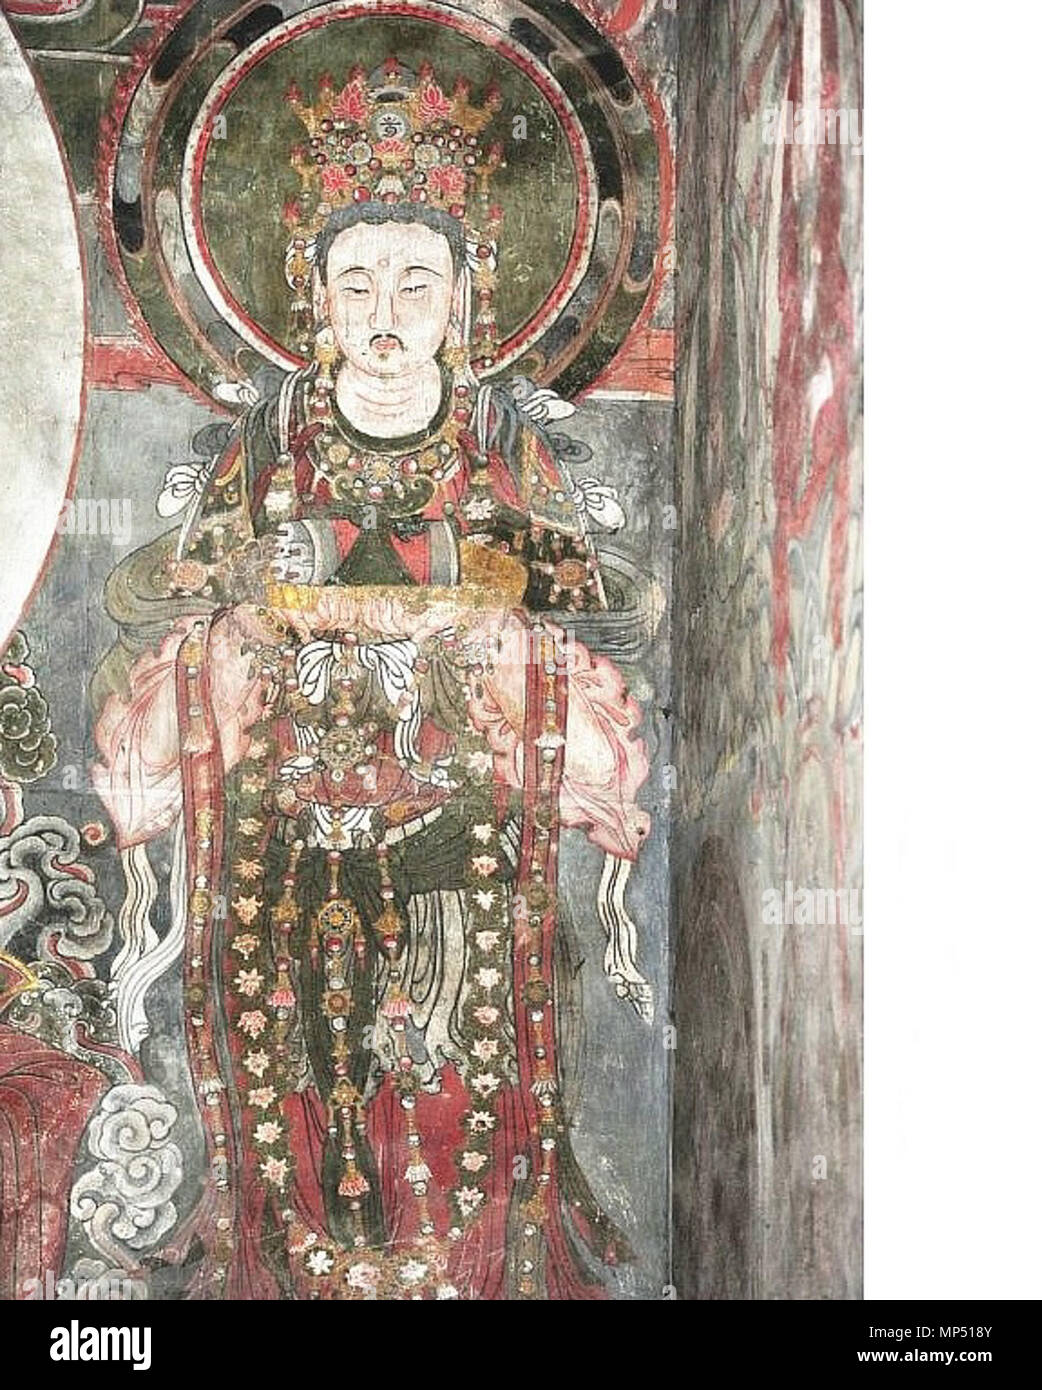 . English: Kin Dynasty (1115-1234) fresco in the Temple of Adoring Bliss (Ch'ung-fu Temple), Shuo-chou, Shansi. Español: Fresco en el Templo de la Adoración de la Prosperidad (Templo Ch'ung-fu), dinastía Kin (1115-1234), Shuo-chóu, Shansí. 5 October 2013, 05:11:49. Unknown artist of Kin Dynasty (1115-1234) 765 Kin Dynasty (1115-1234) fresco in Ch'ung-fu Temple, Shuo-chou 14 - Stock Image